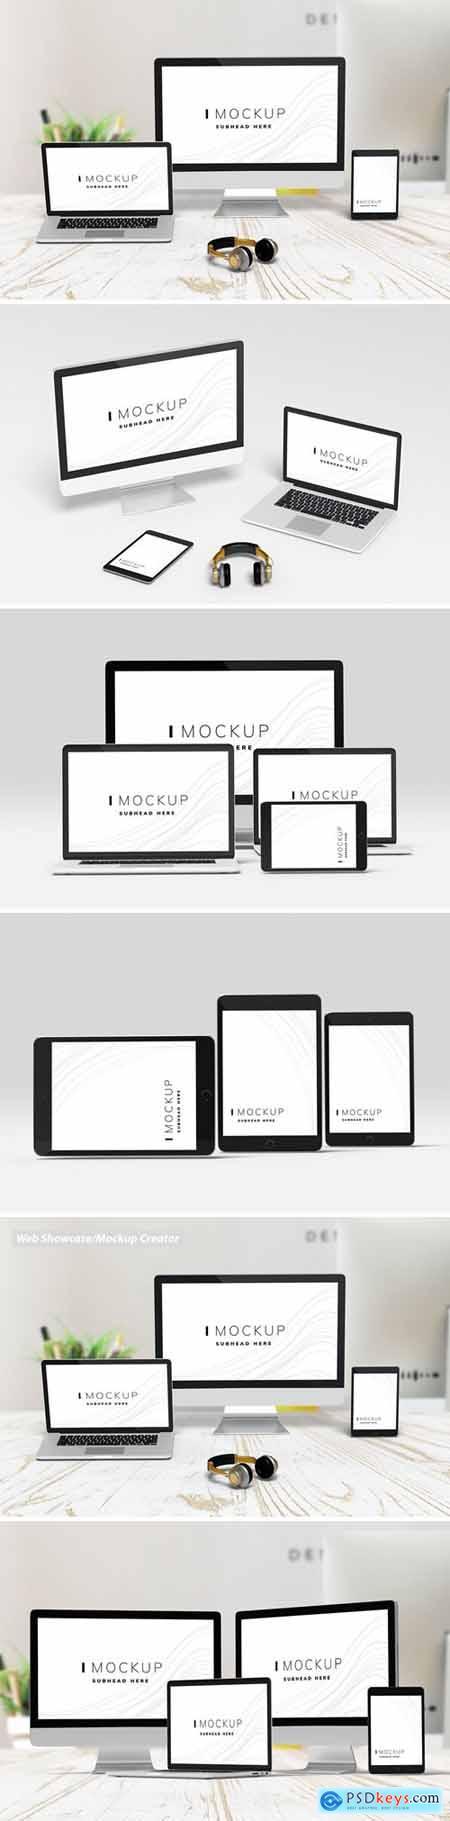 Web Showcase - Mockup Creator